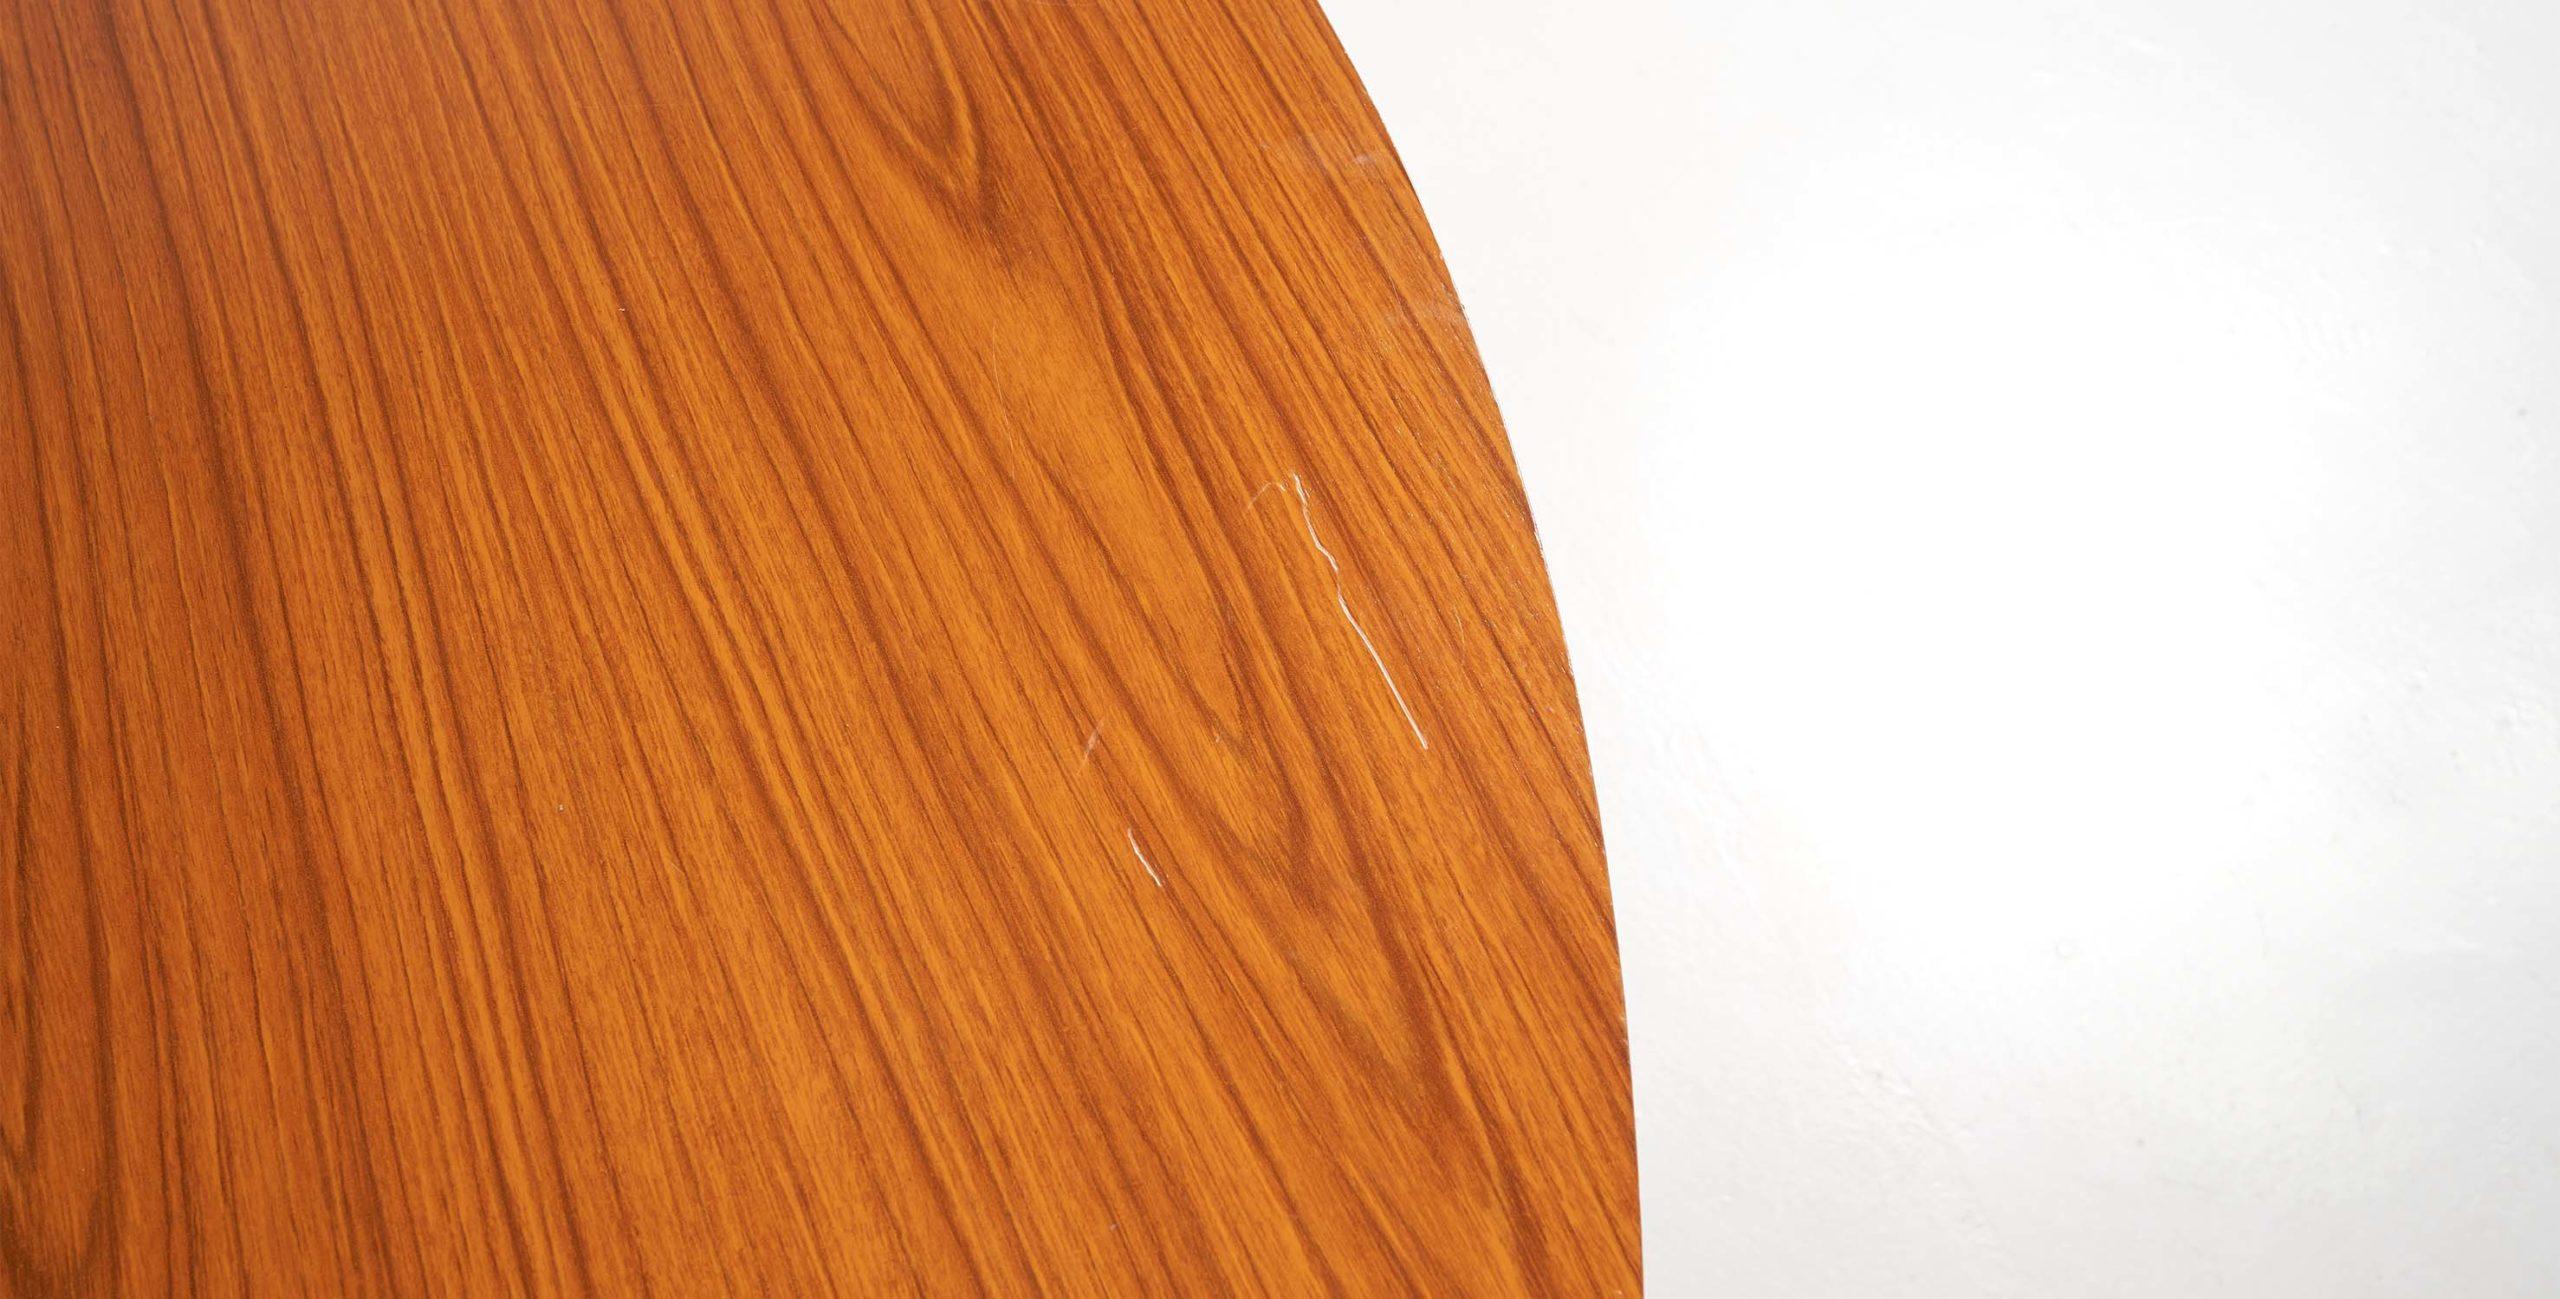 Table formica, table ovale vintage, table ovale, table ovale extensible, table vintage, table à manger ovale vintage, table scandinave, table formica, table extensible vintage